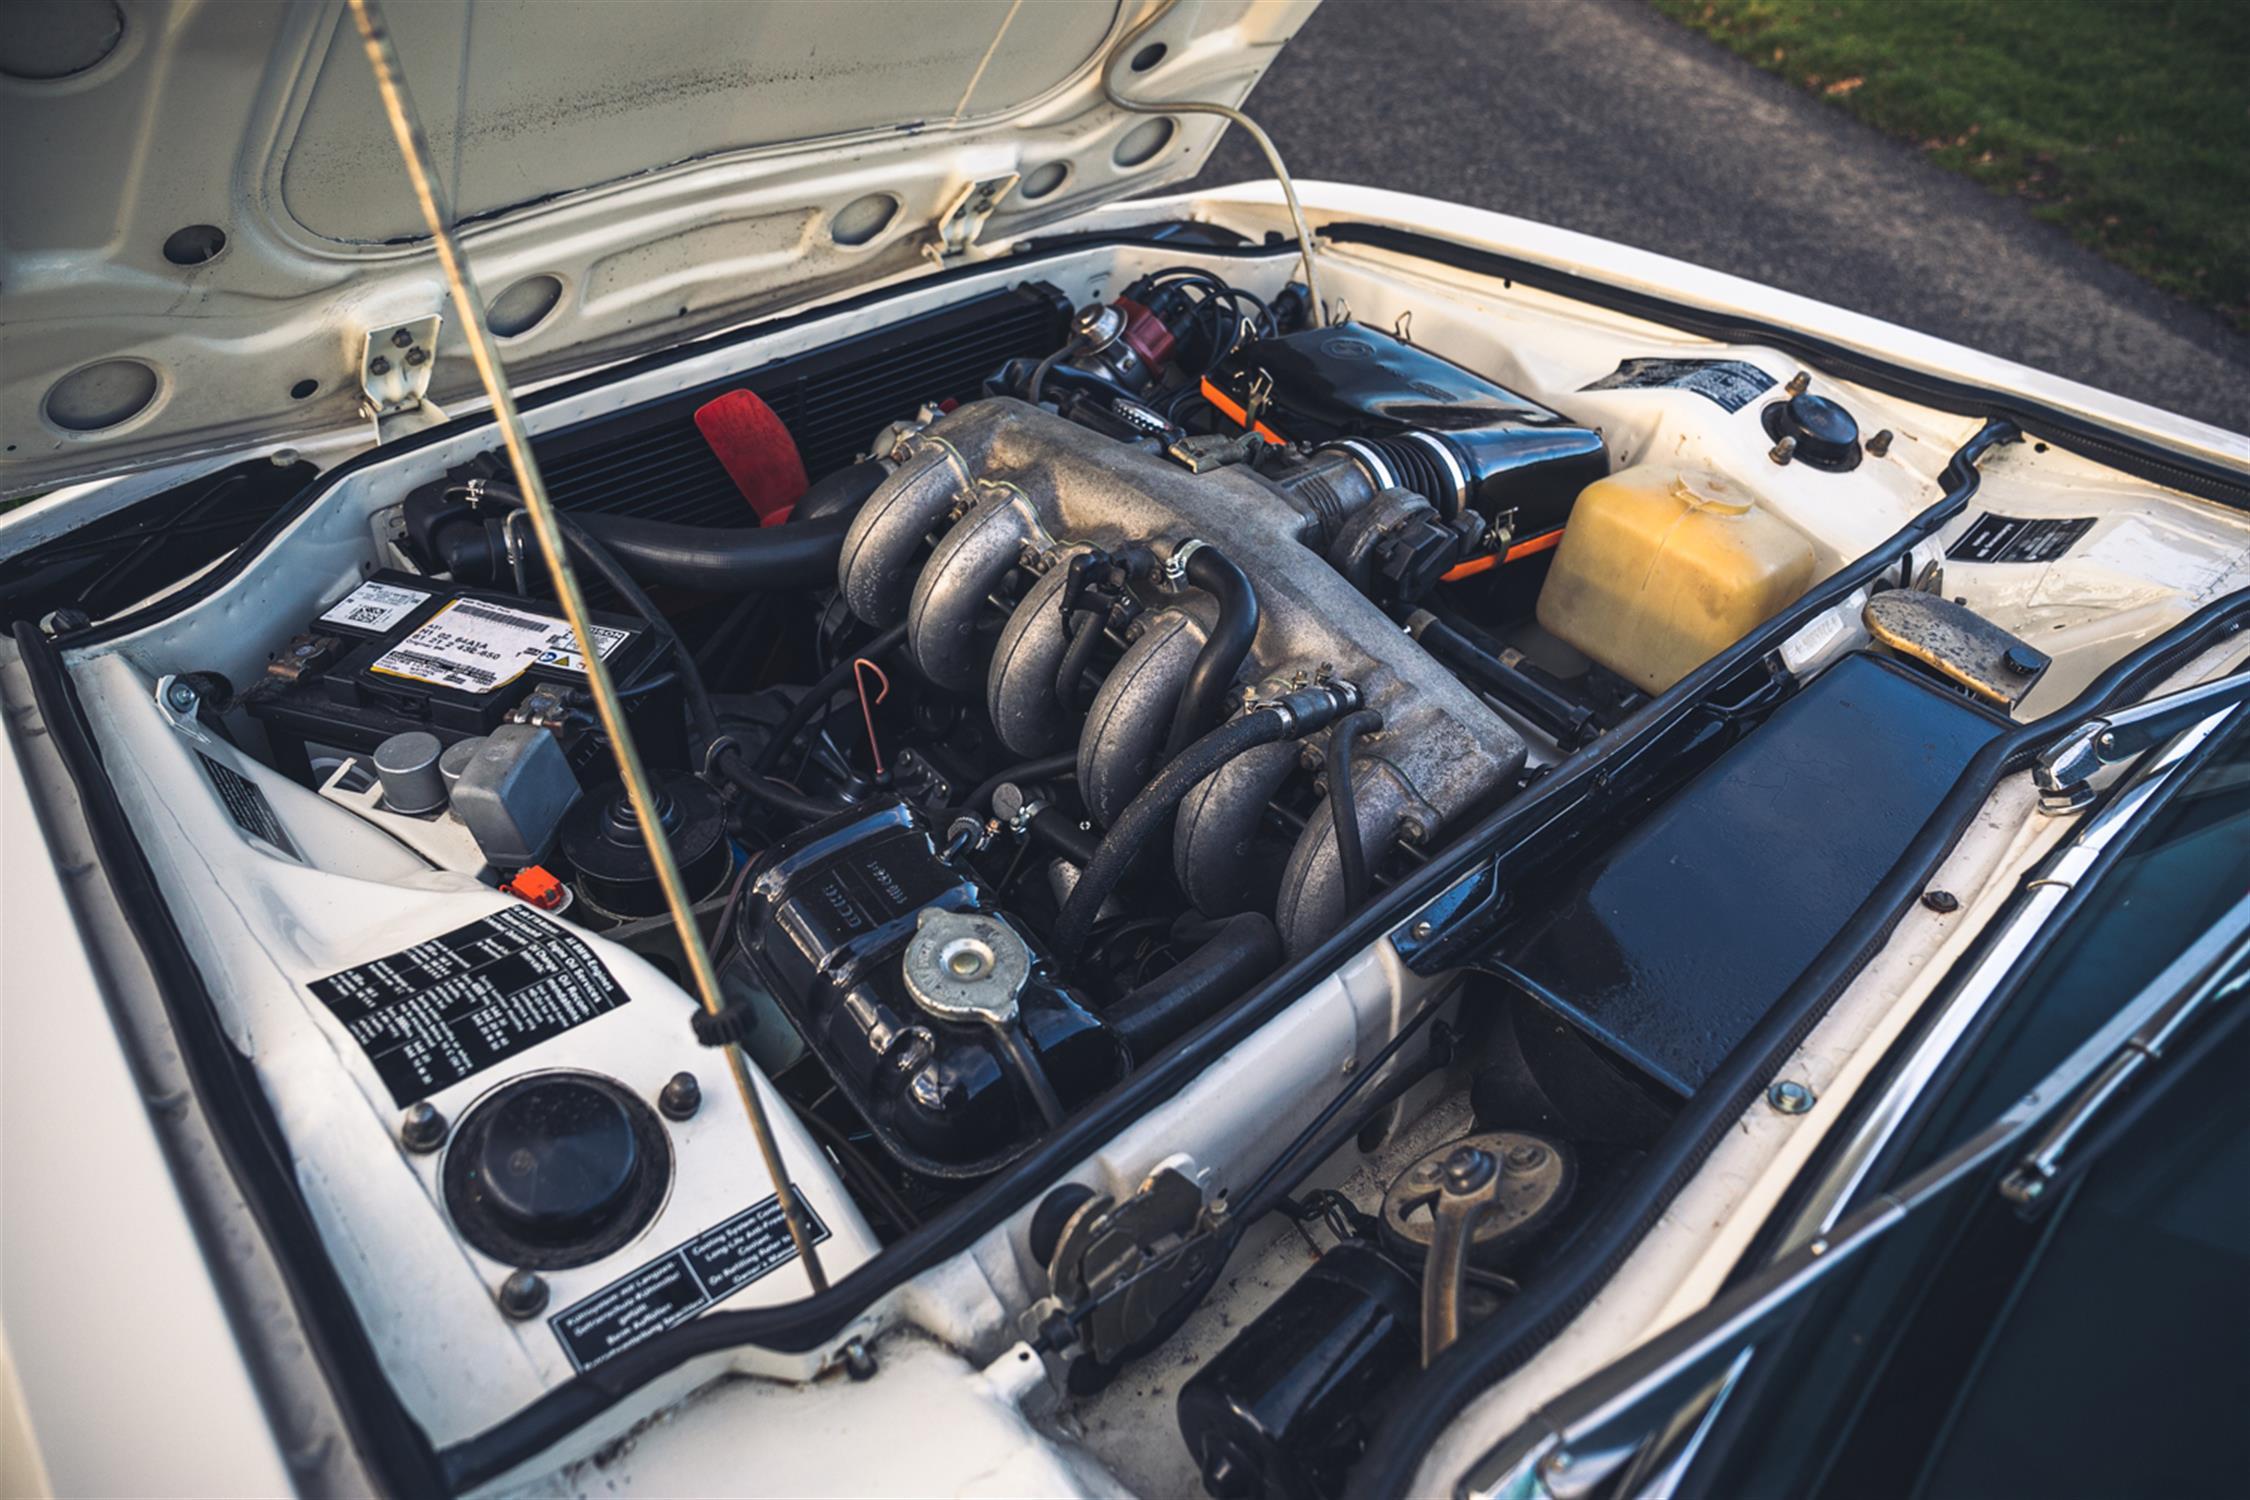 1973 BMW 3.0 CSL - Image 4 of 10